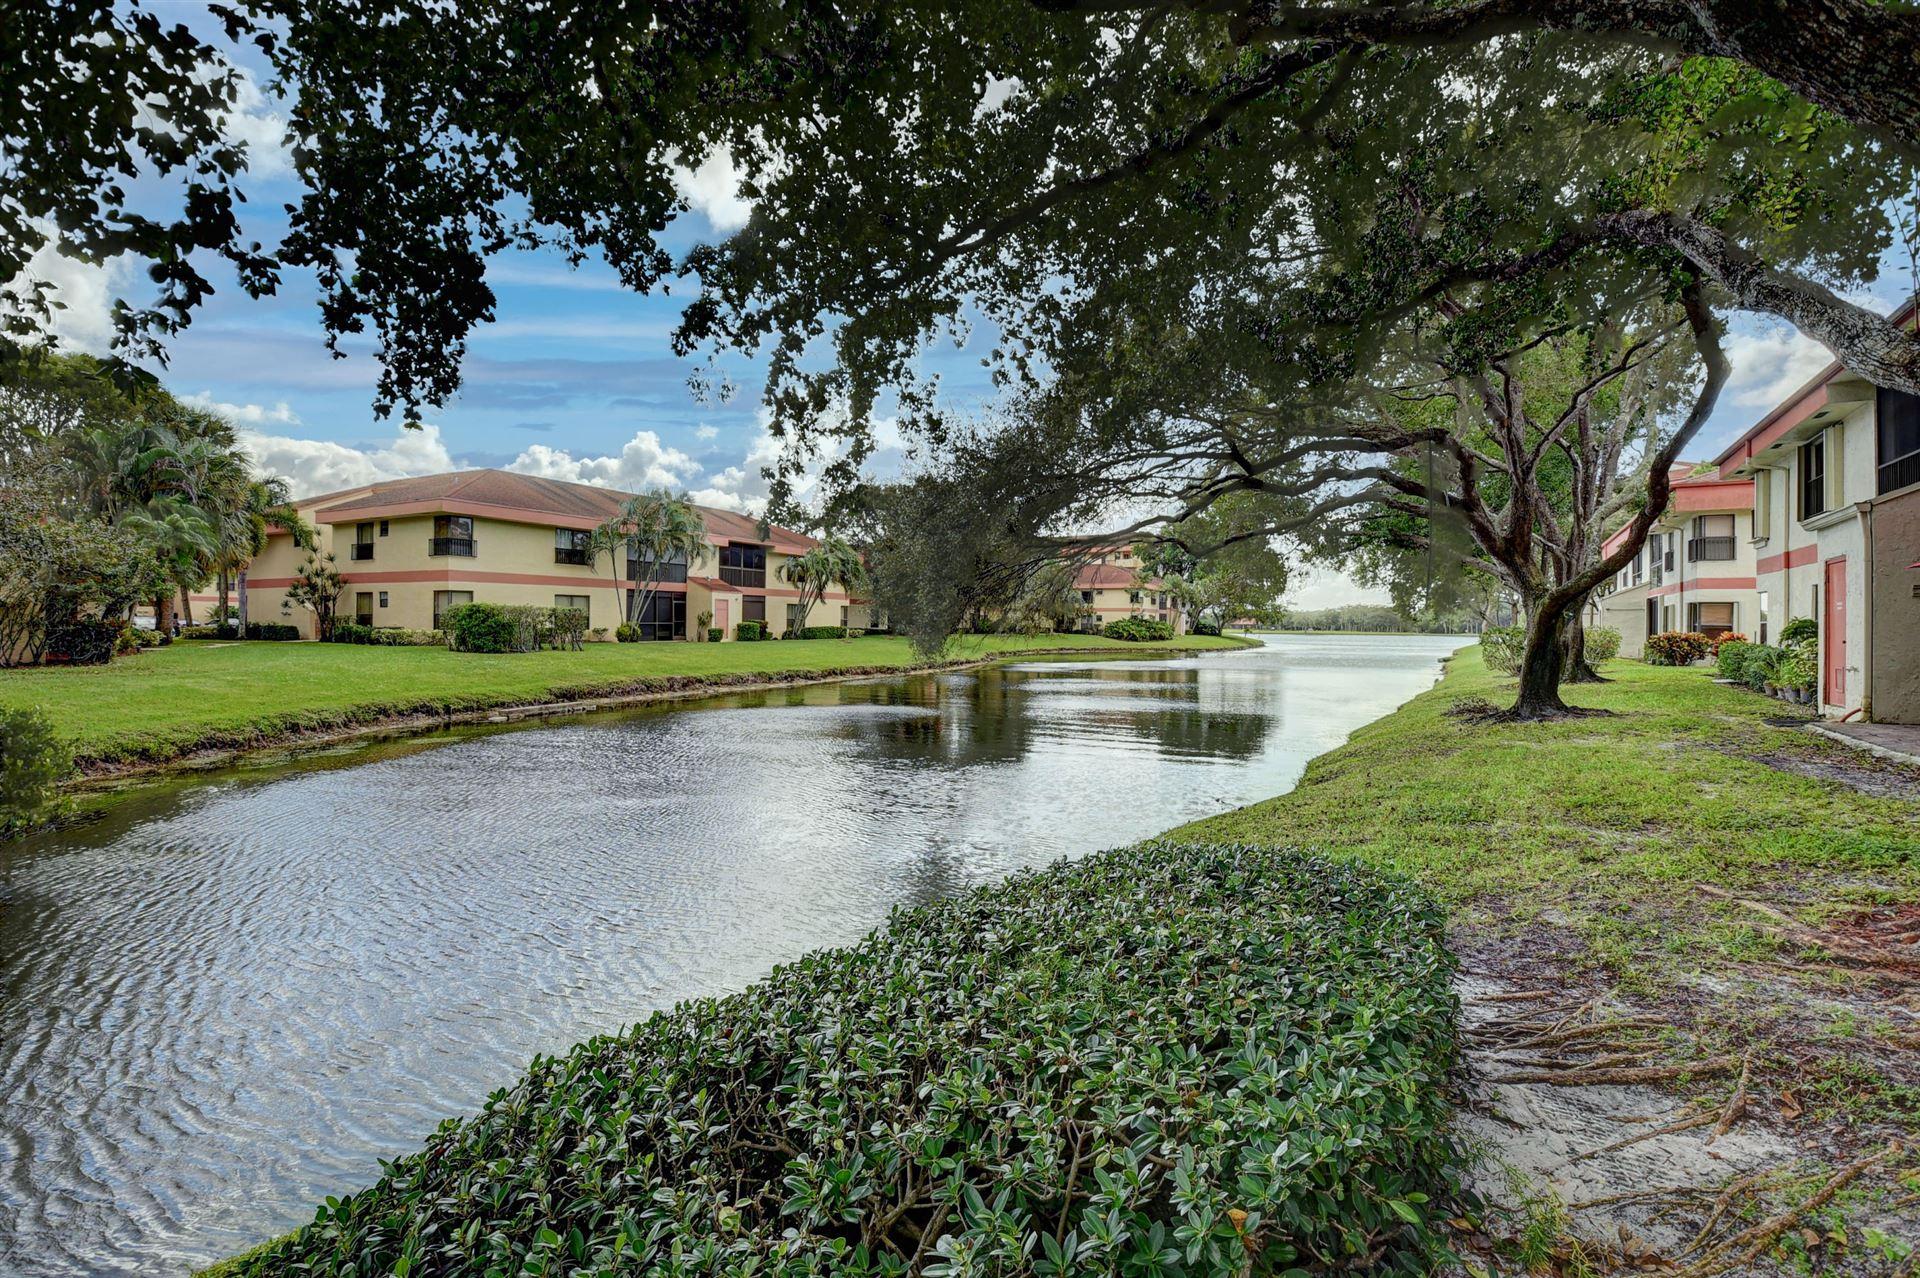 Photo of 2881 Carambola Circle S, Coconut Creek, FL 33066 (MLS # RX-10674333)